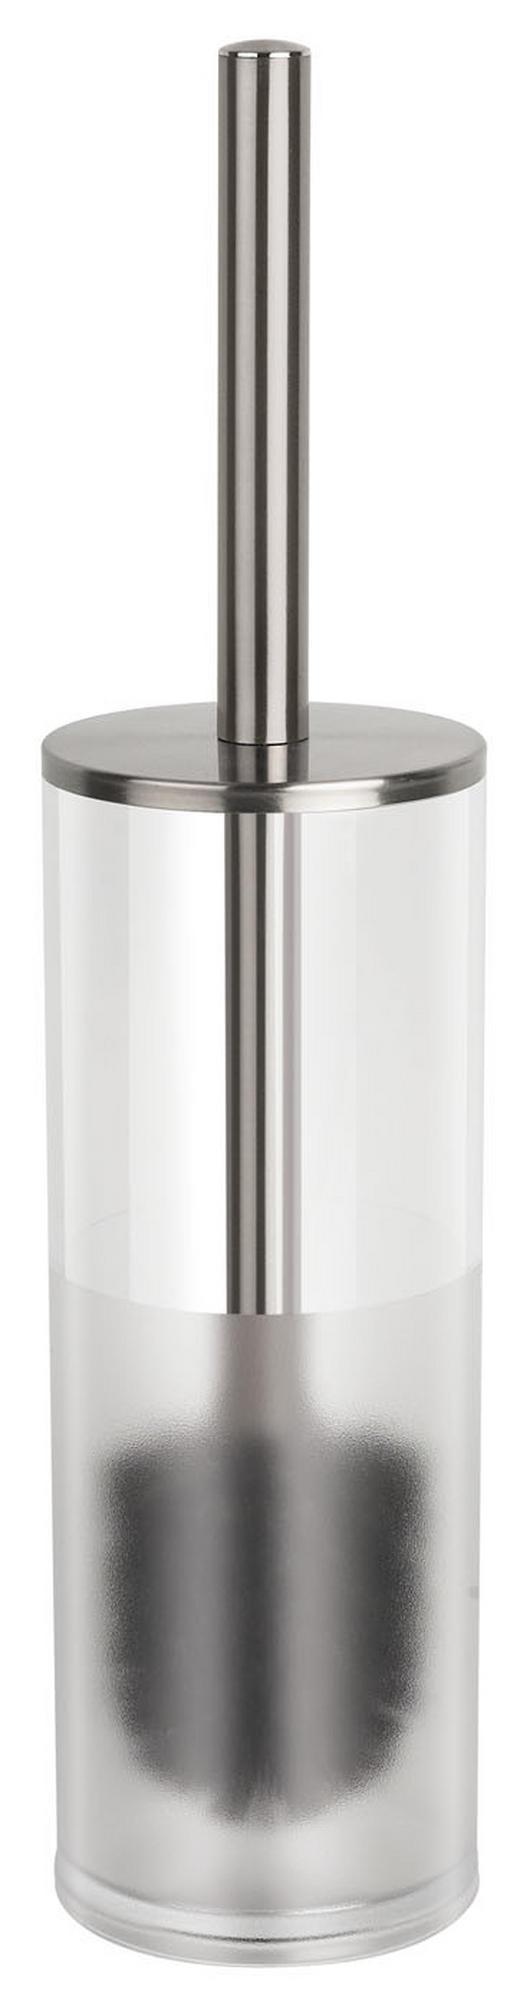 WC-BÜRSTENGARNITUR - Klar/Chromfarben, Basics, Kunststoff (9.5/40cm) - SPIRELLA